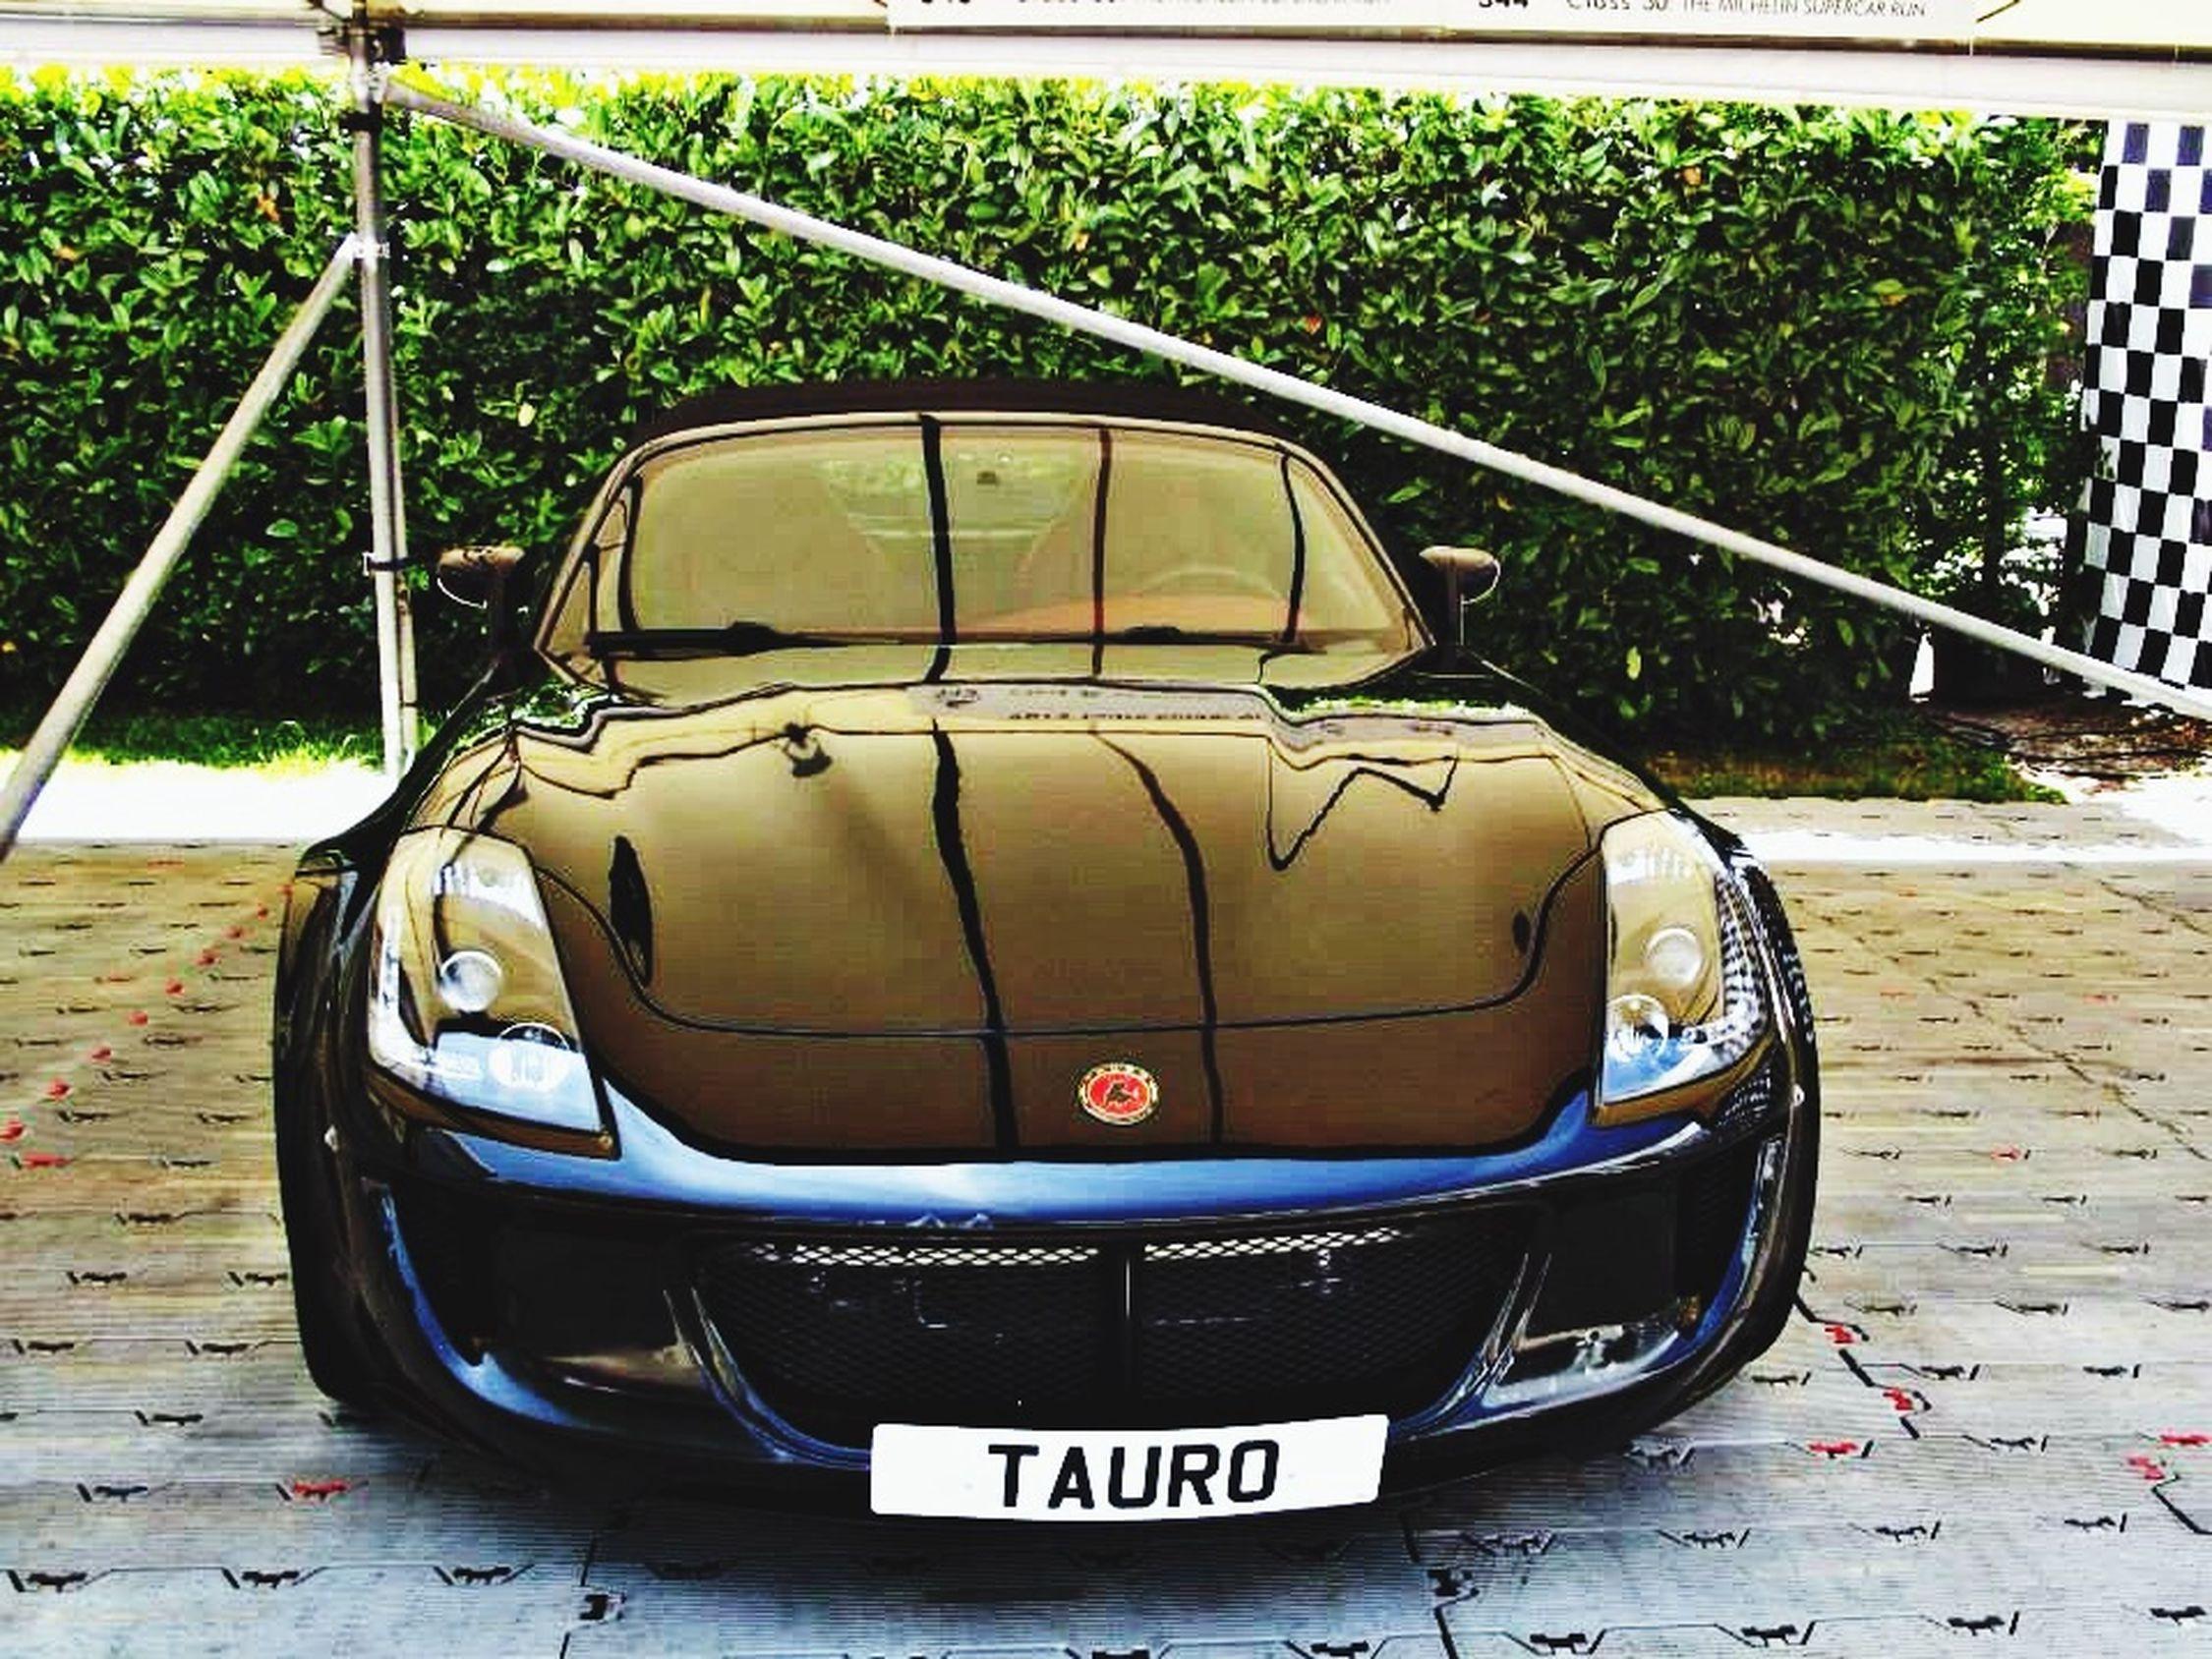 Tauro Auto Spot Goodwood Festival Of Speed 2013 Car Black